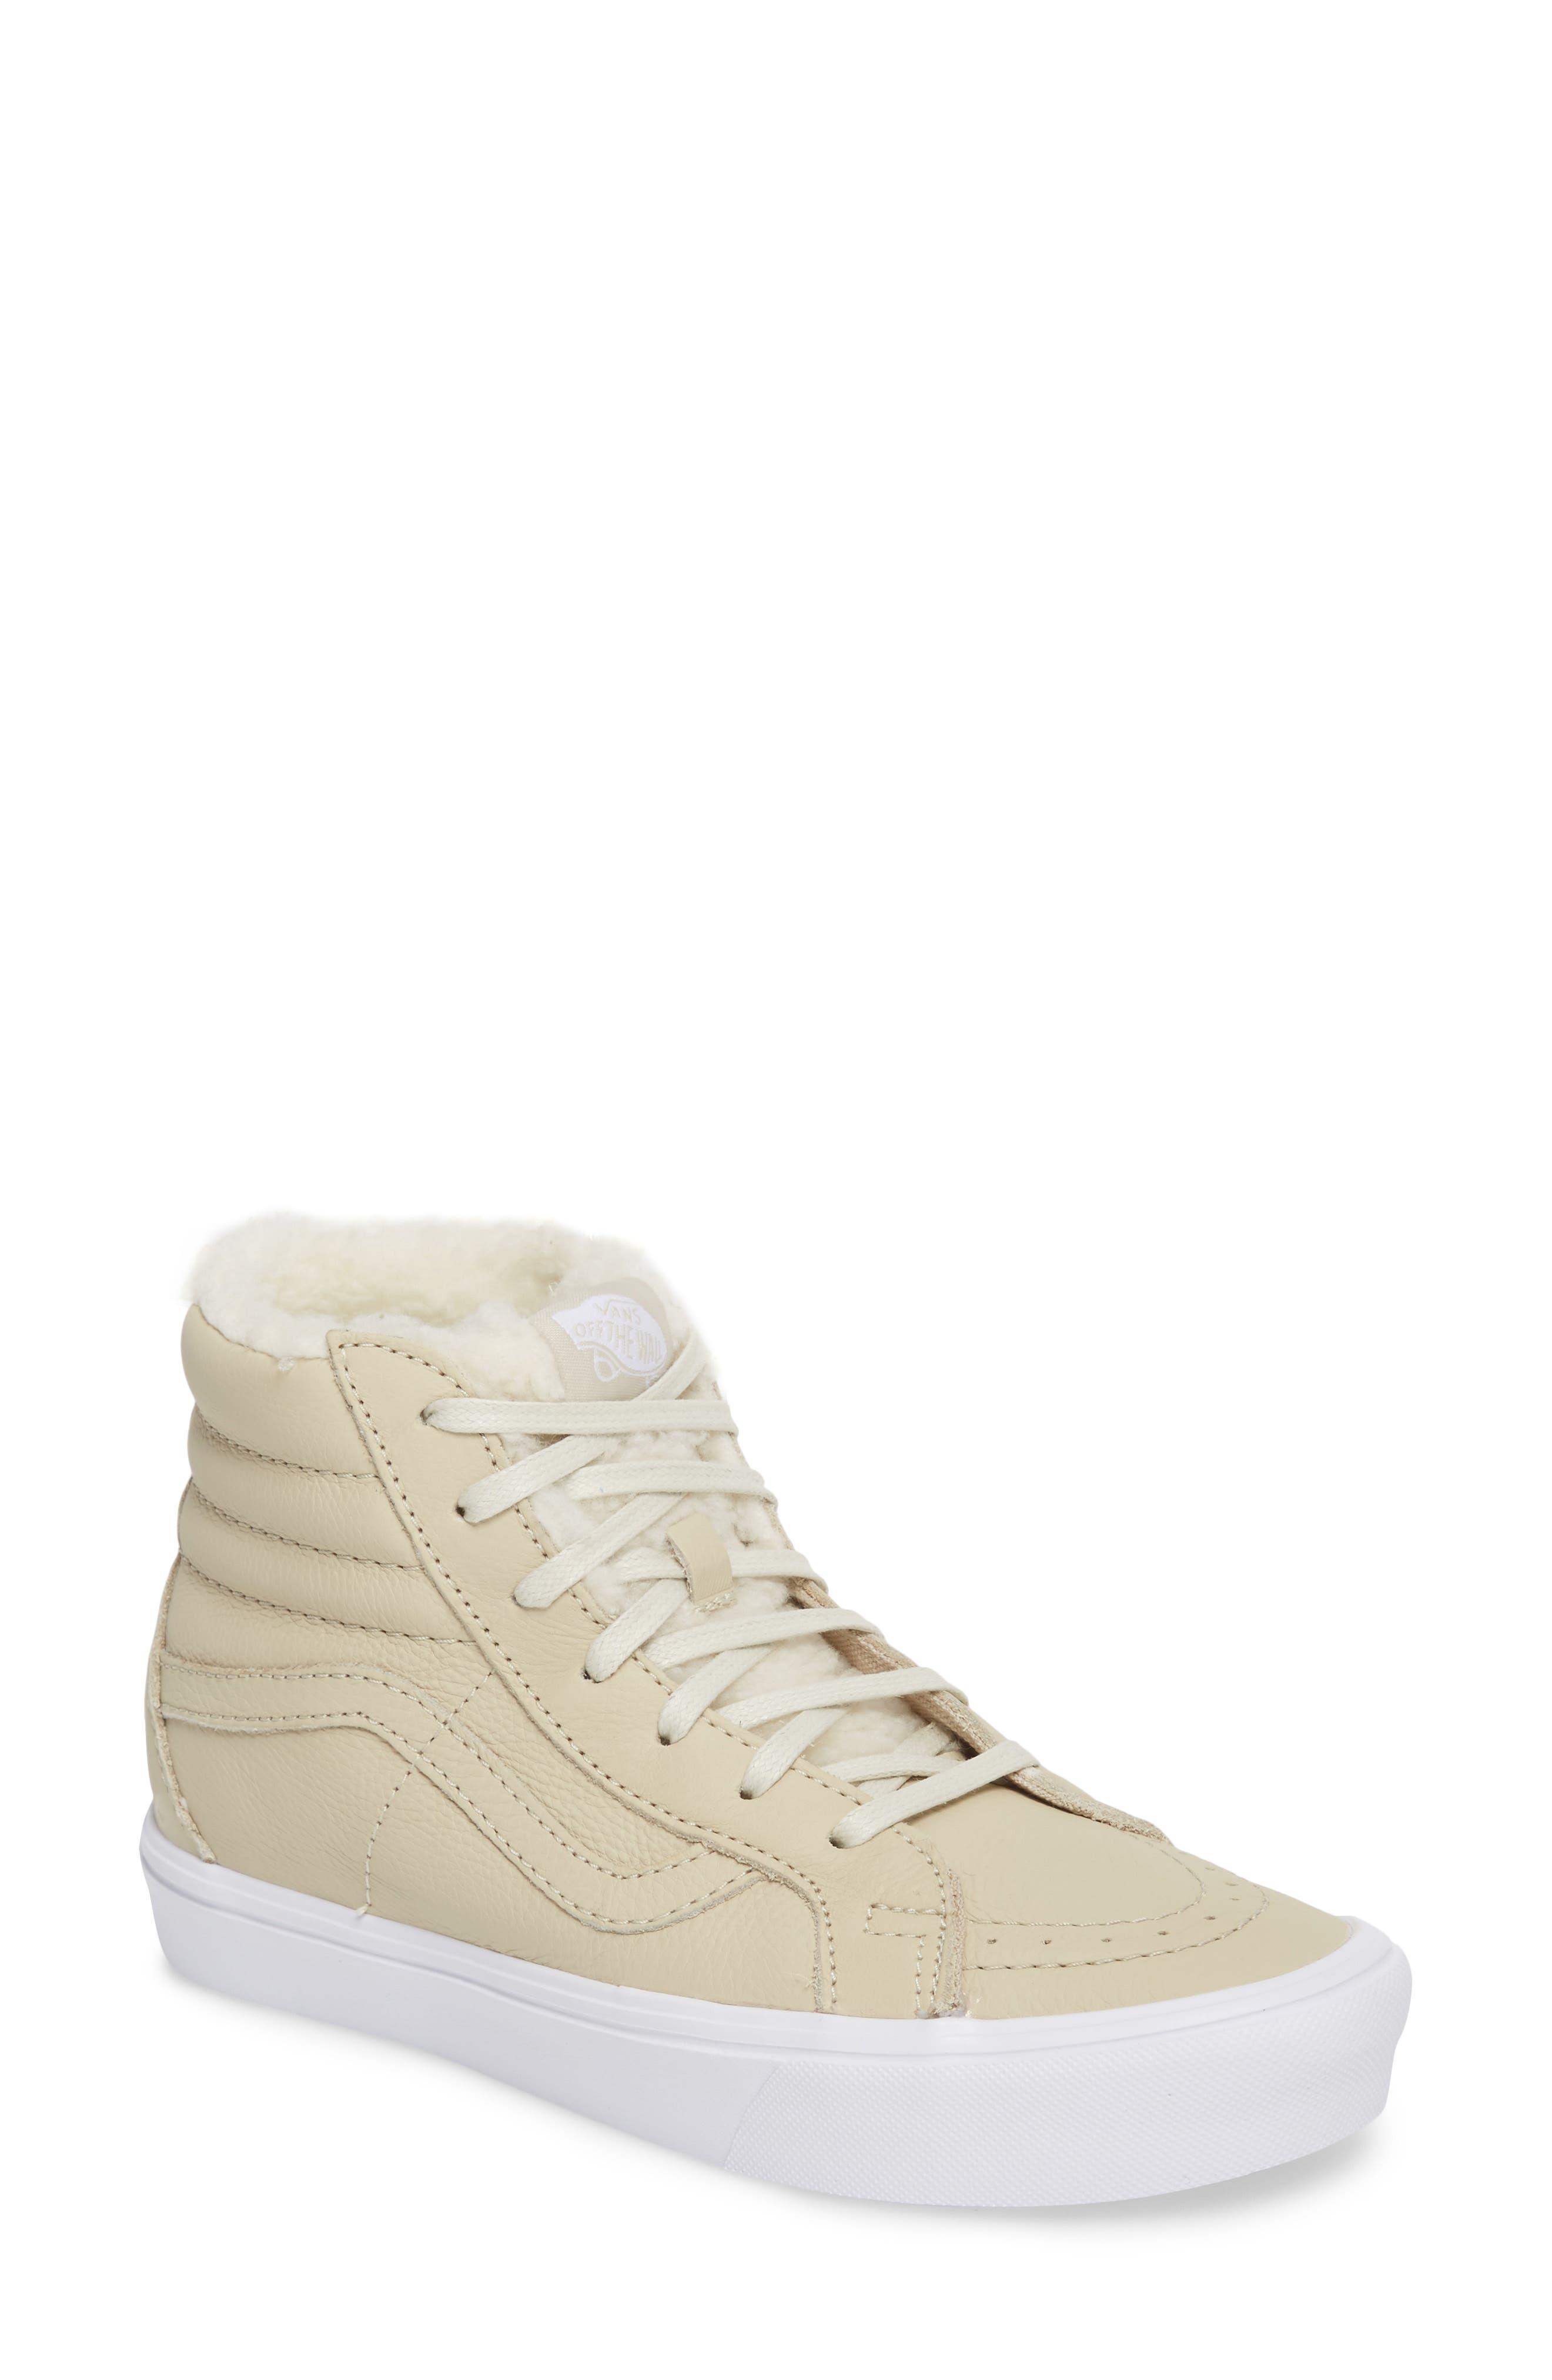 Sk8-Hi Reissue Lite High Top Sneaker,                         Main,                         color, Cement/ True White